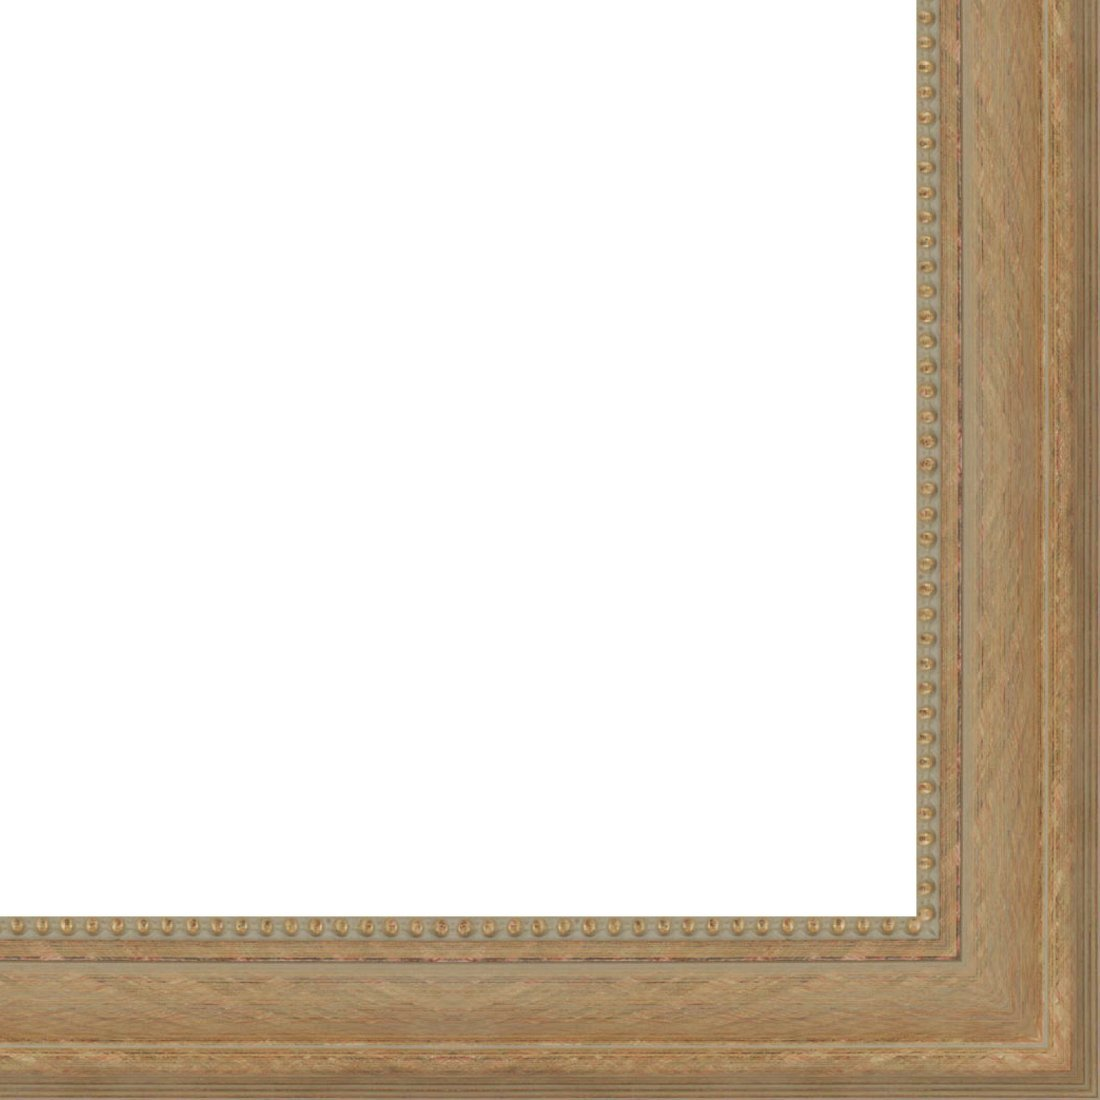 Picture Frame Moulding (Wood) 18ft bundle - Traditional Antique Gold Finish - 3'' width - 7/16'' rabbet depth